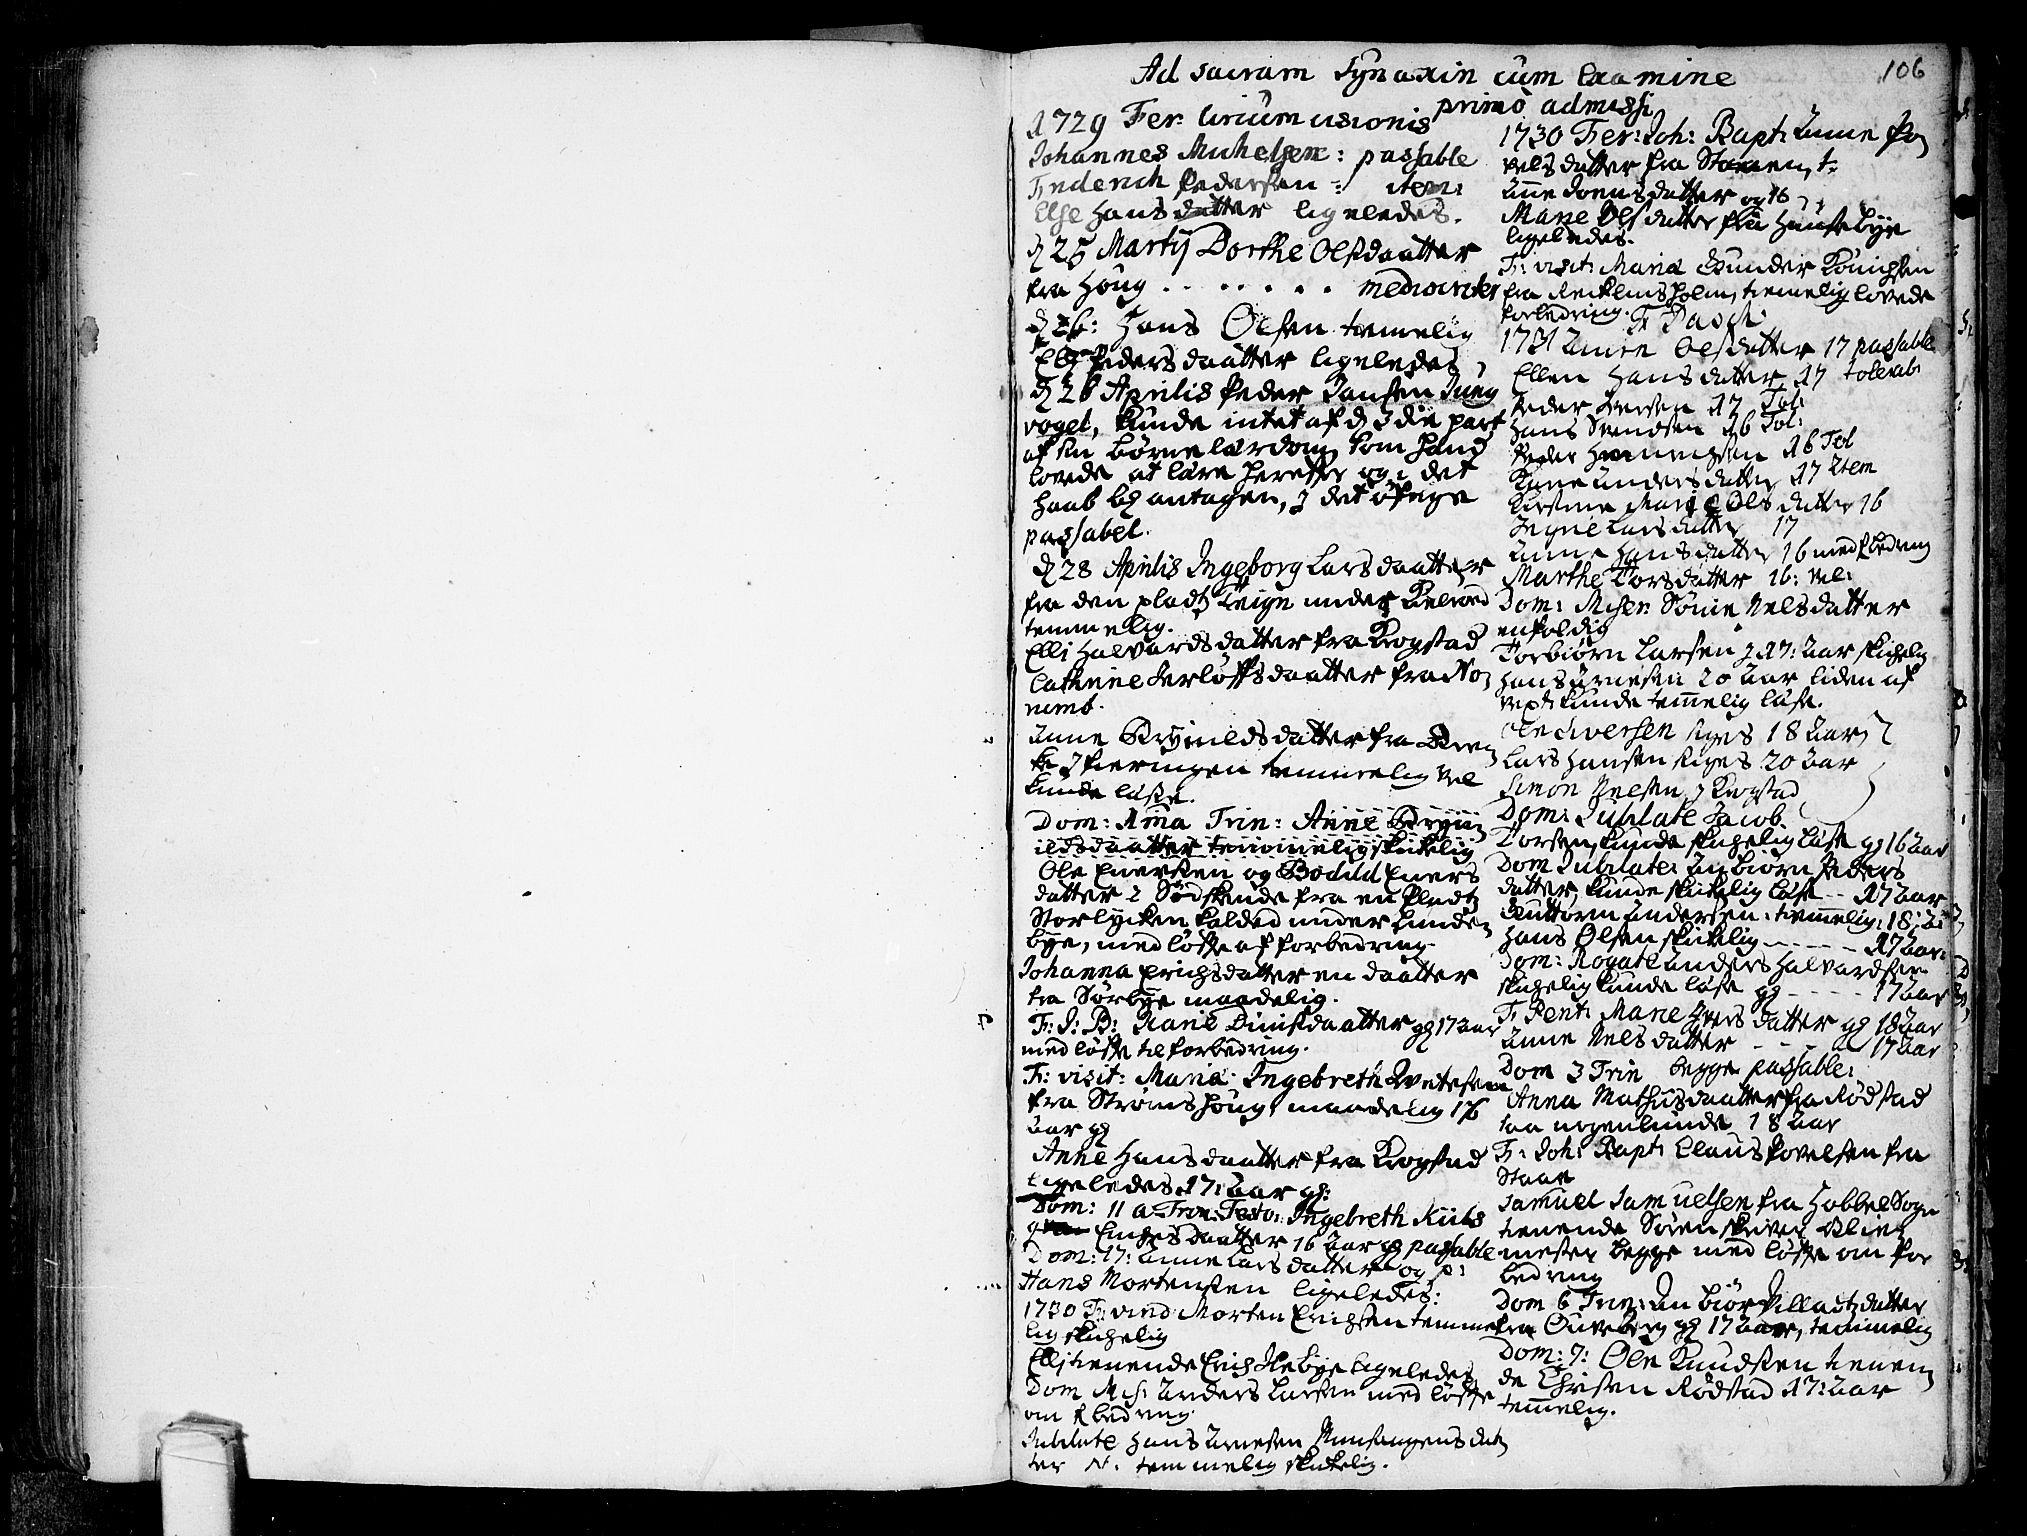 SAO, Råde prestekontor kirkebøker, F/Fa/L0001: Ministerialbok nr. 1, 1707-1762, s. 106